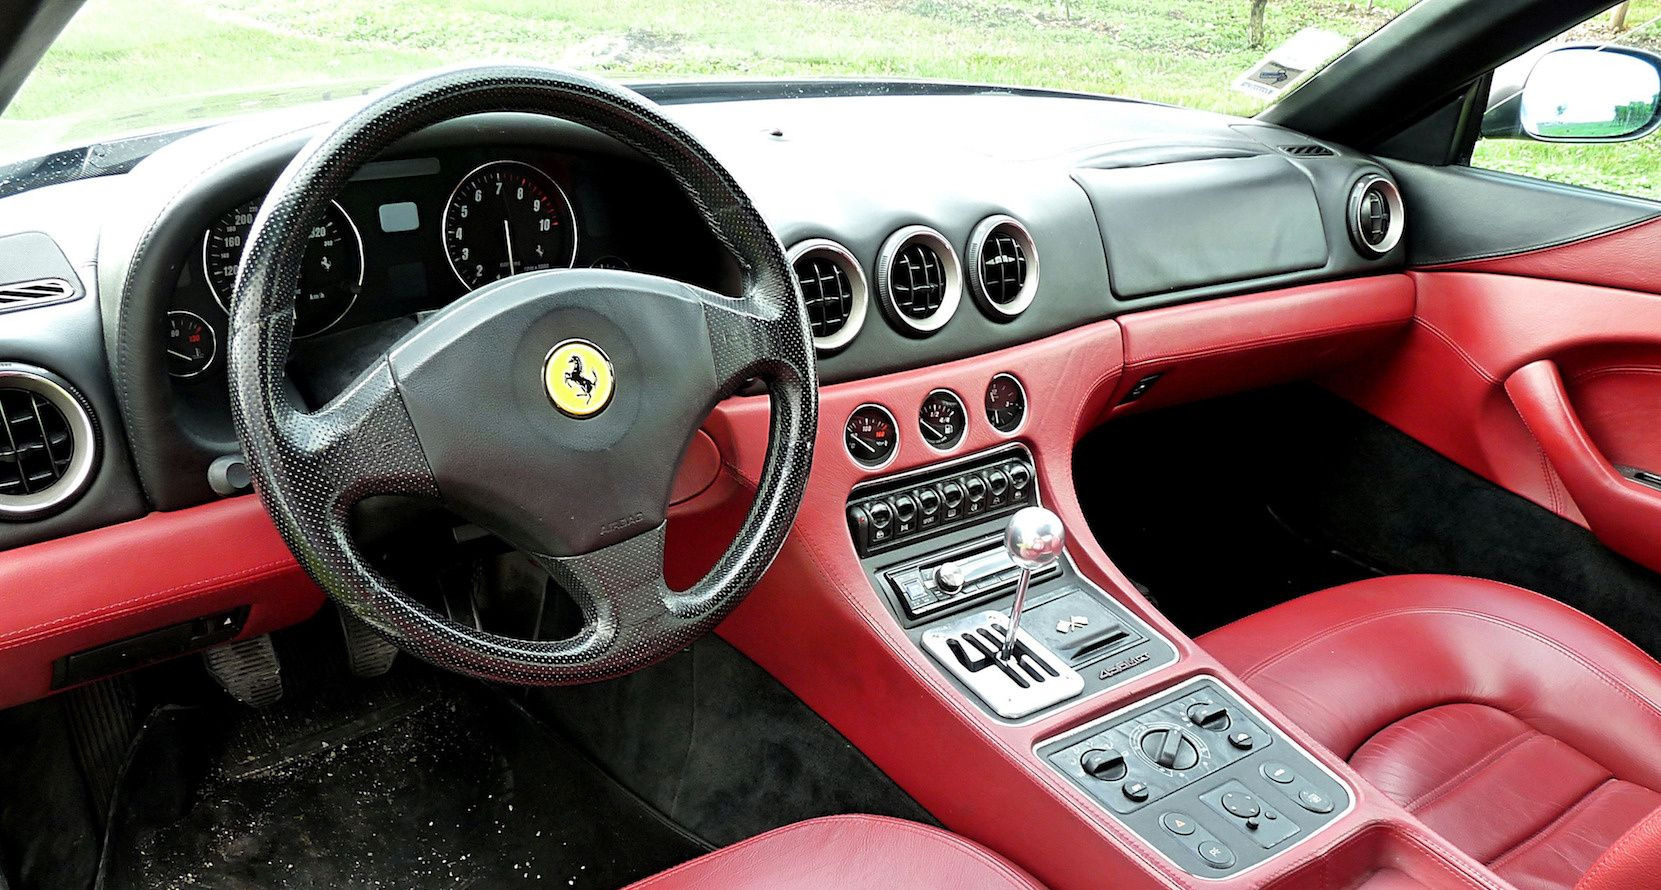 Ferrari 456 MGT planchede bord